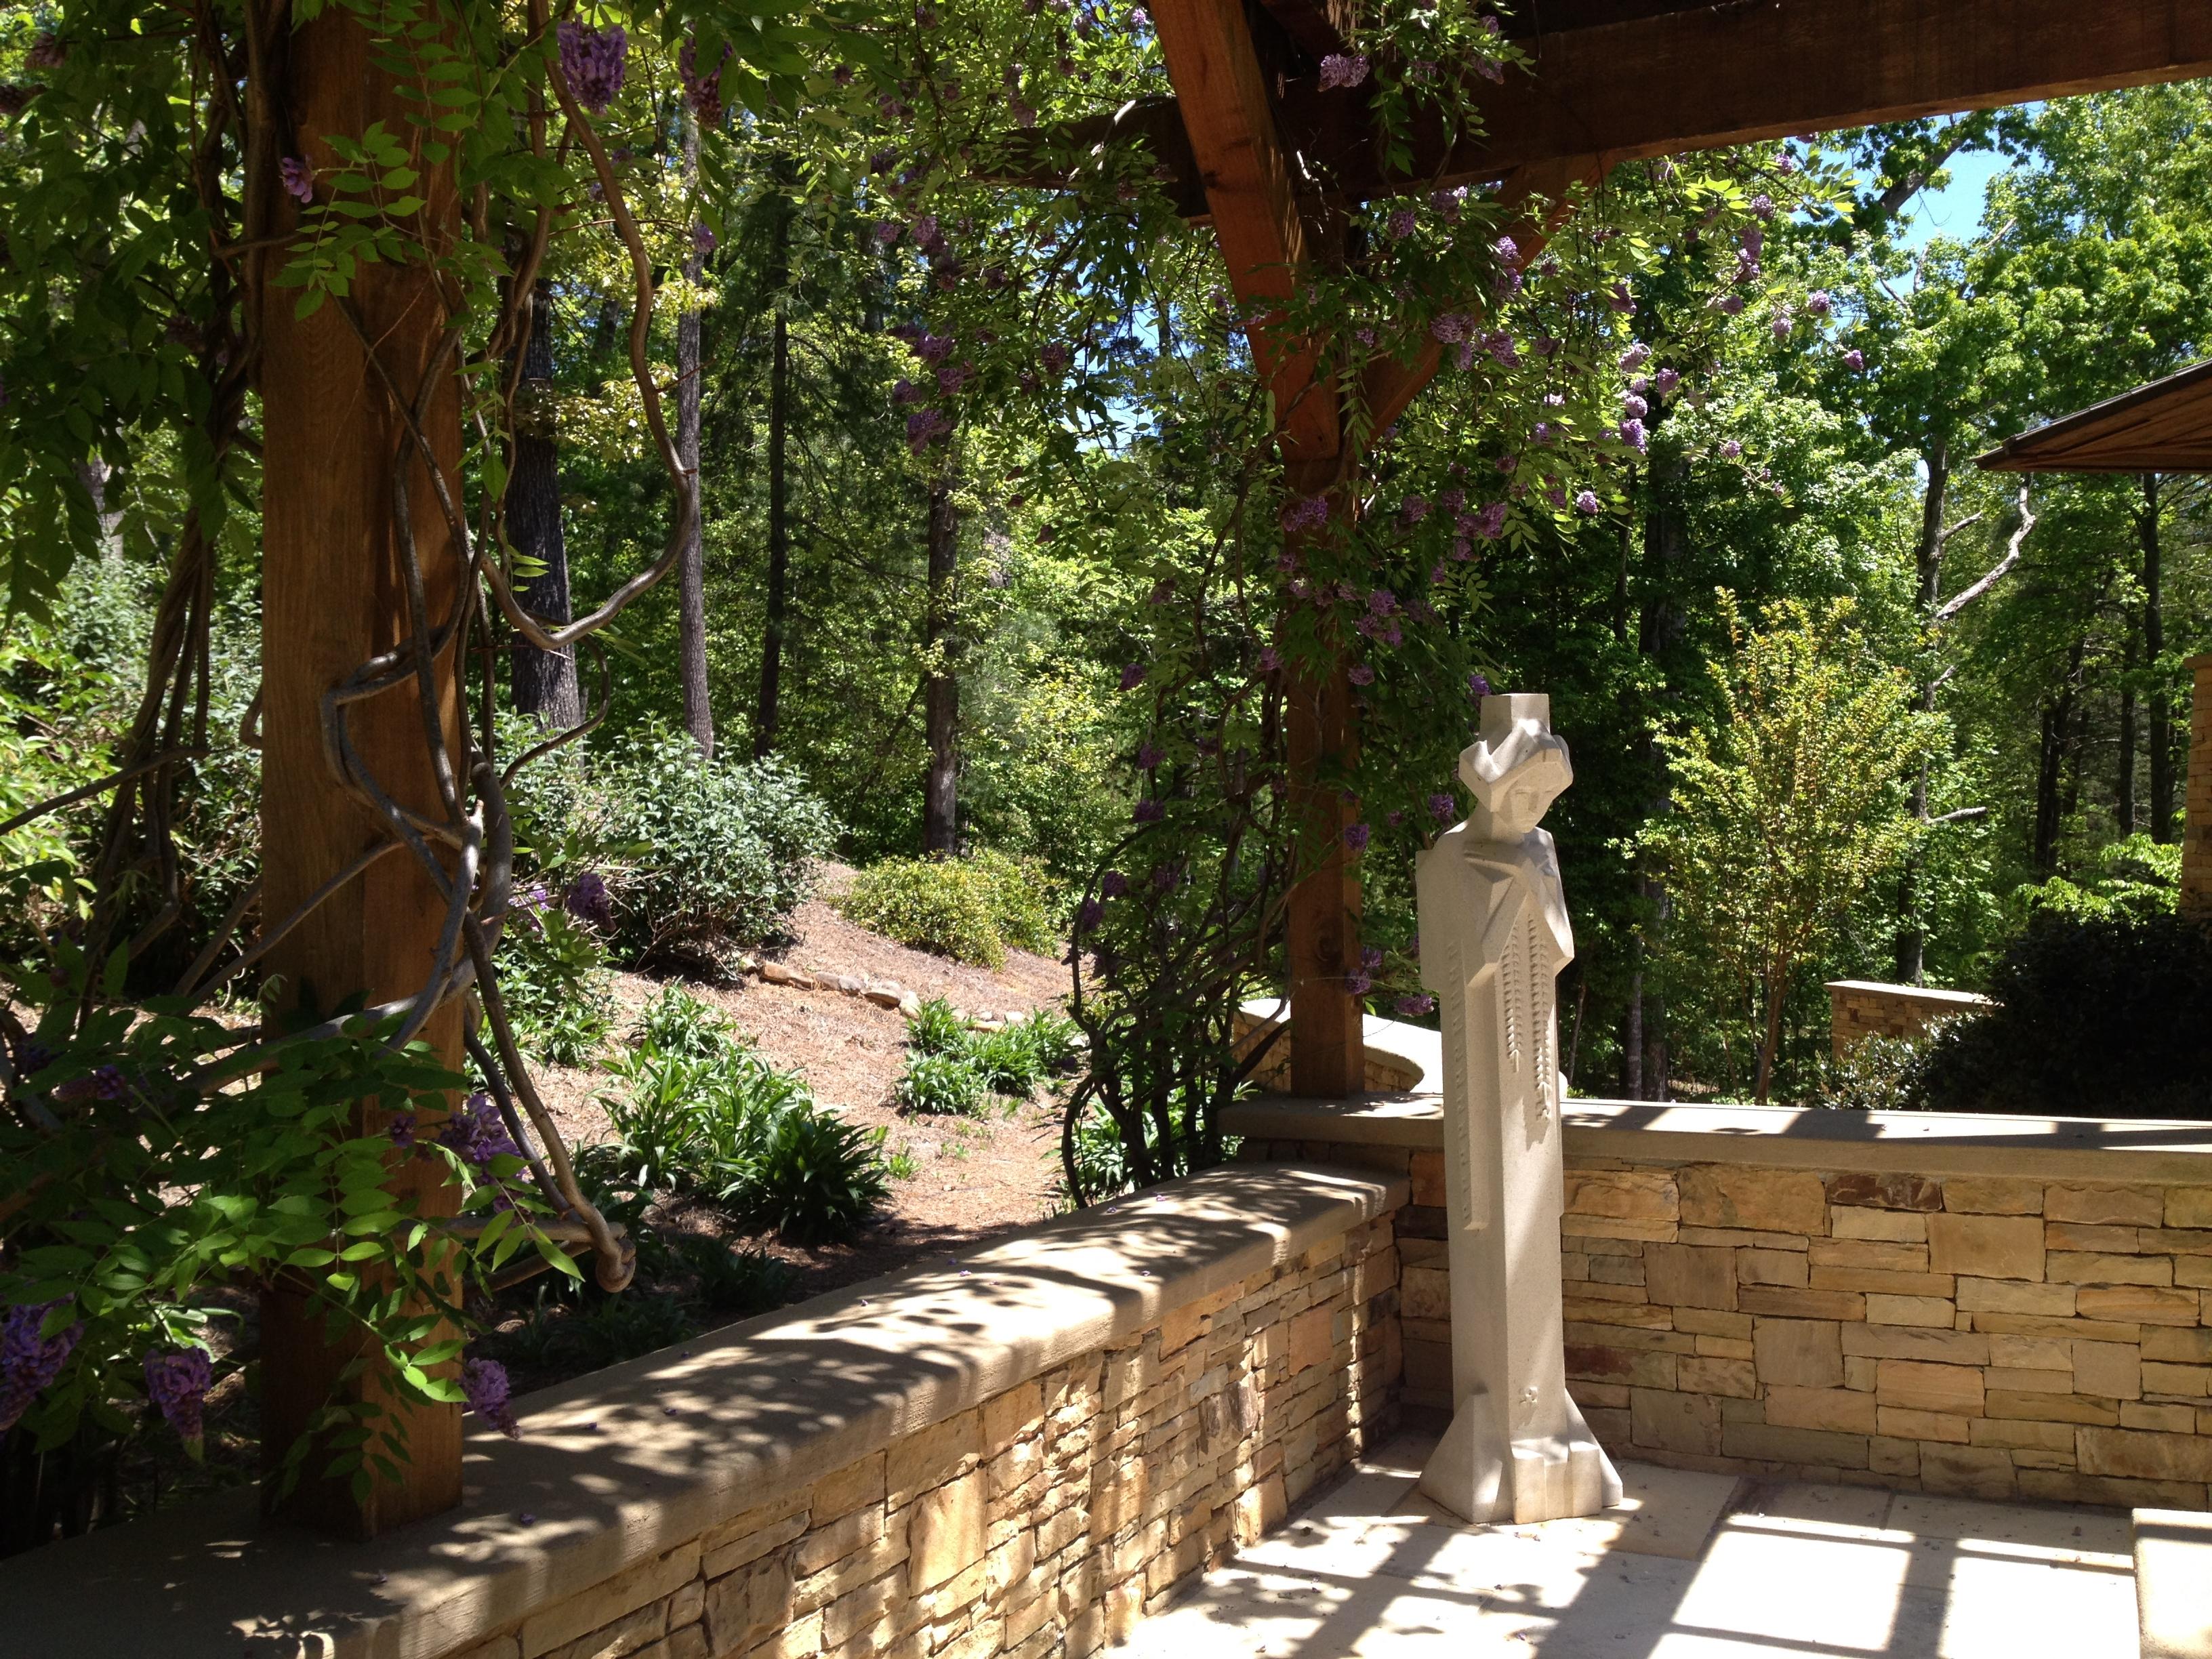 Maid In The Mud Garden Sprite By Frank Lloyd Wright